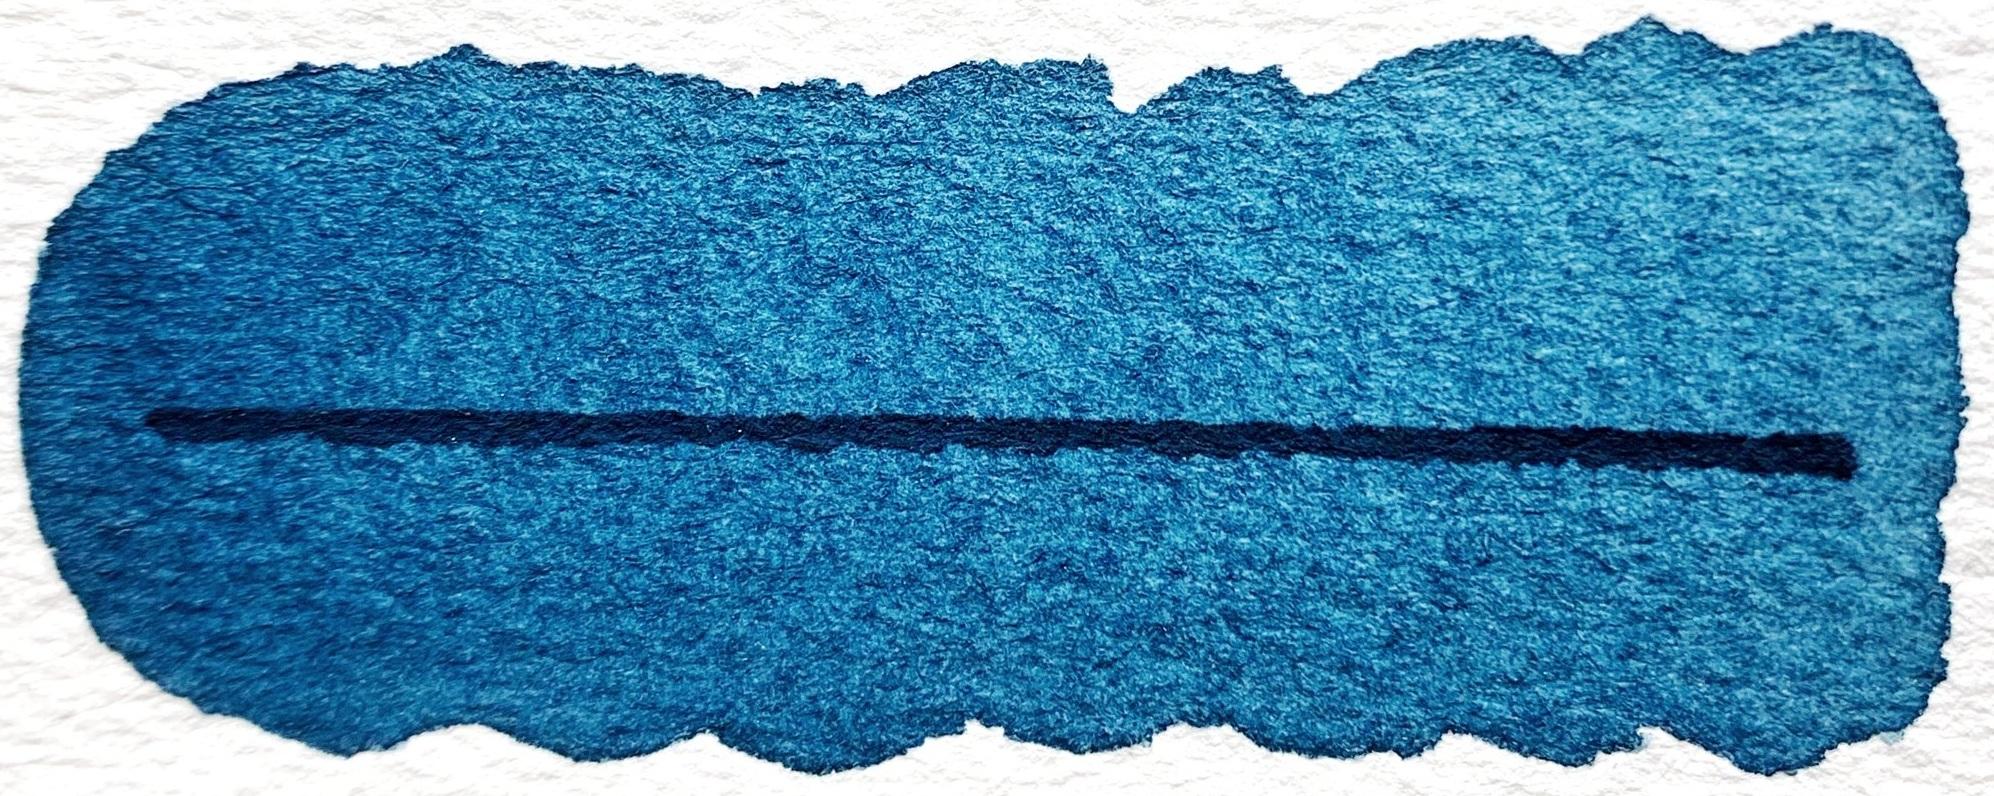 Mayan Royal Blue - PB82, semitransparent, good lightfastness, mildly staining